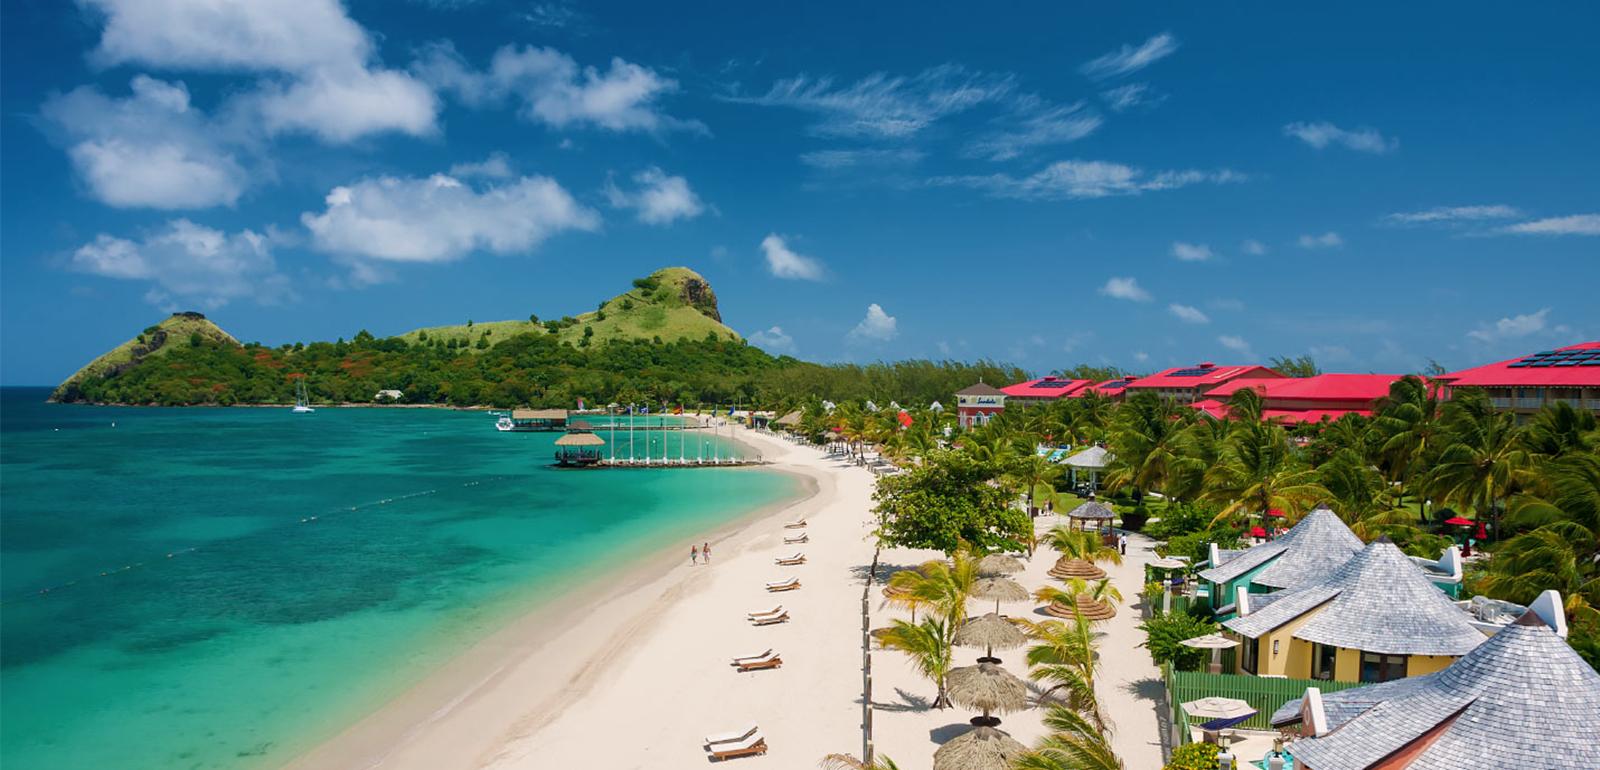 St-Lucia-Honeymoons-Sandals-Grande-St-Lucia-Header